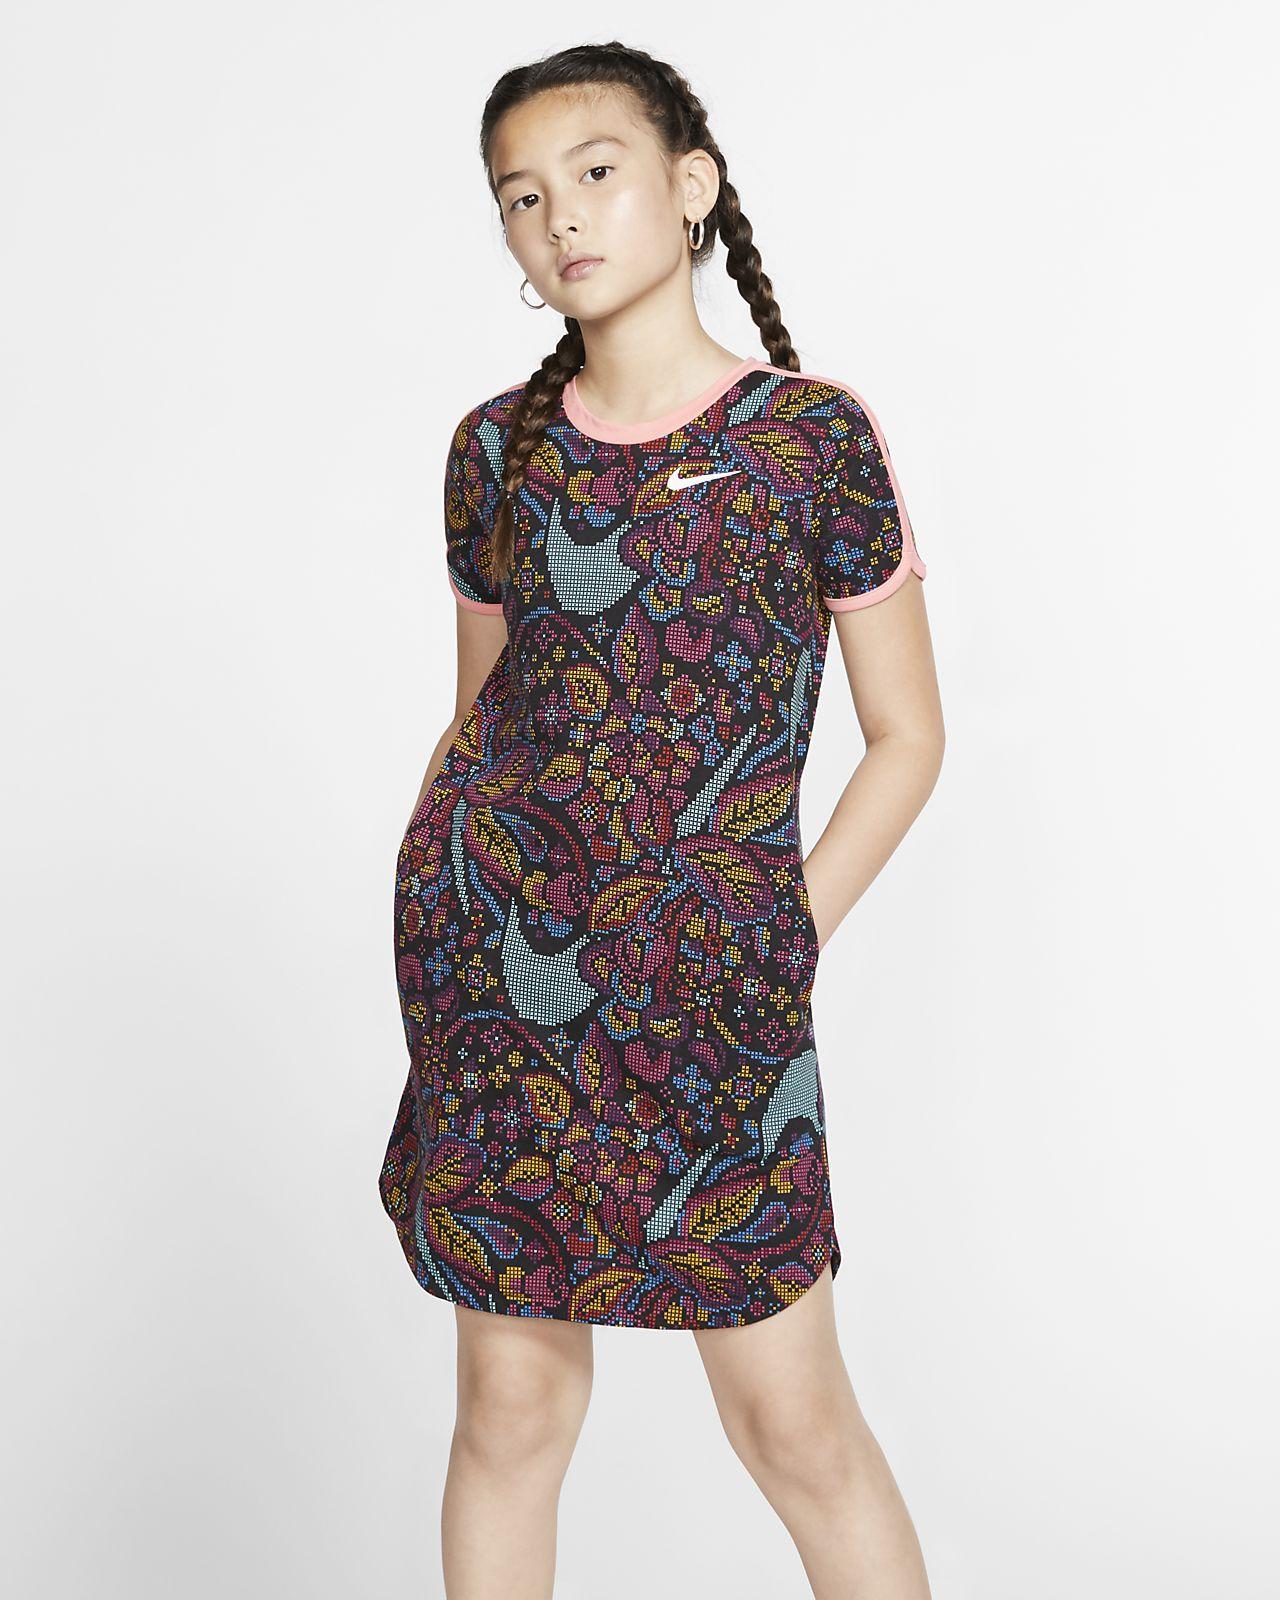 Abito con Swoosh Nike Sportswear - Bambina/Ragazza